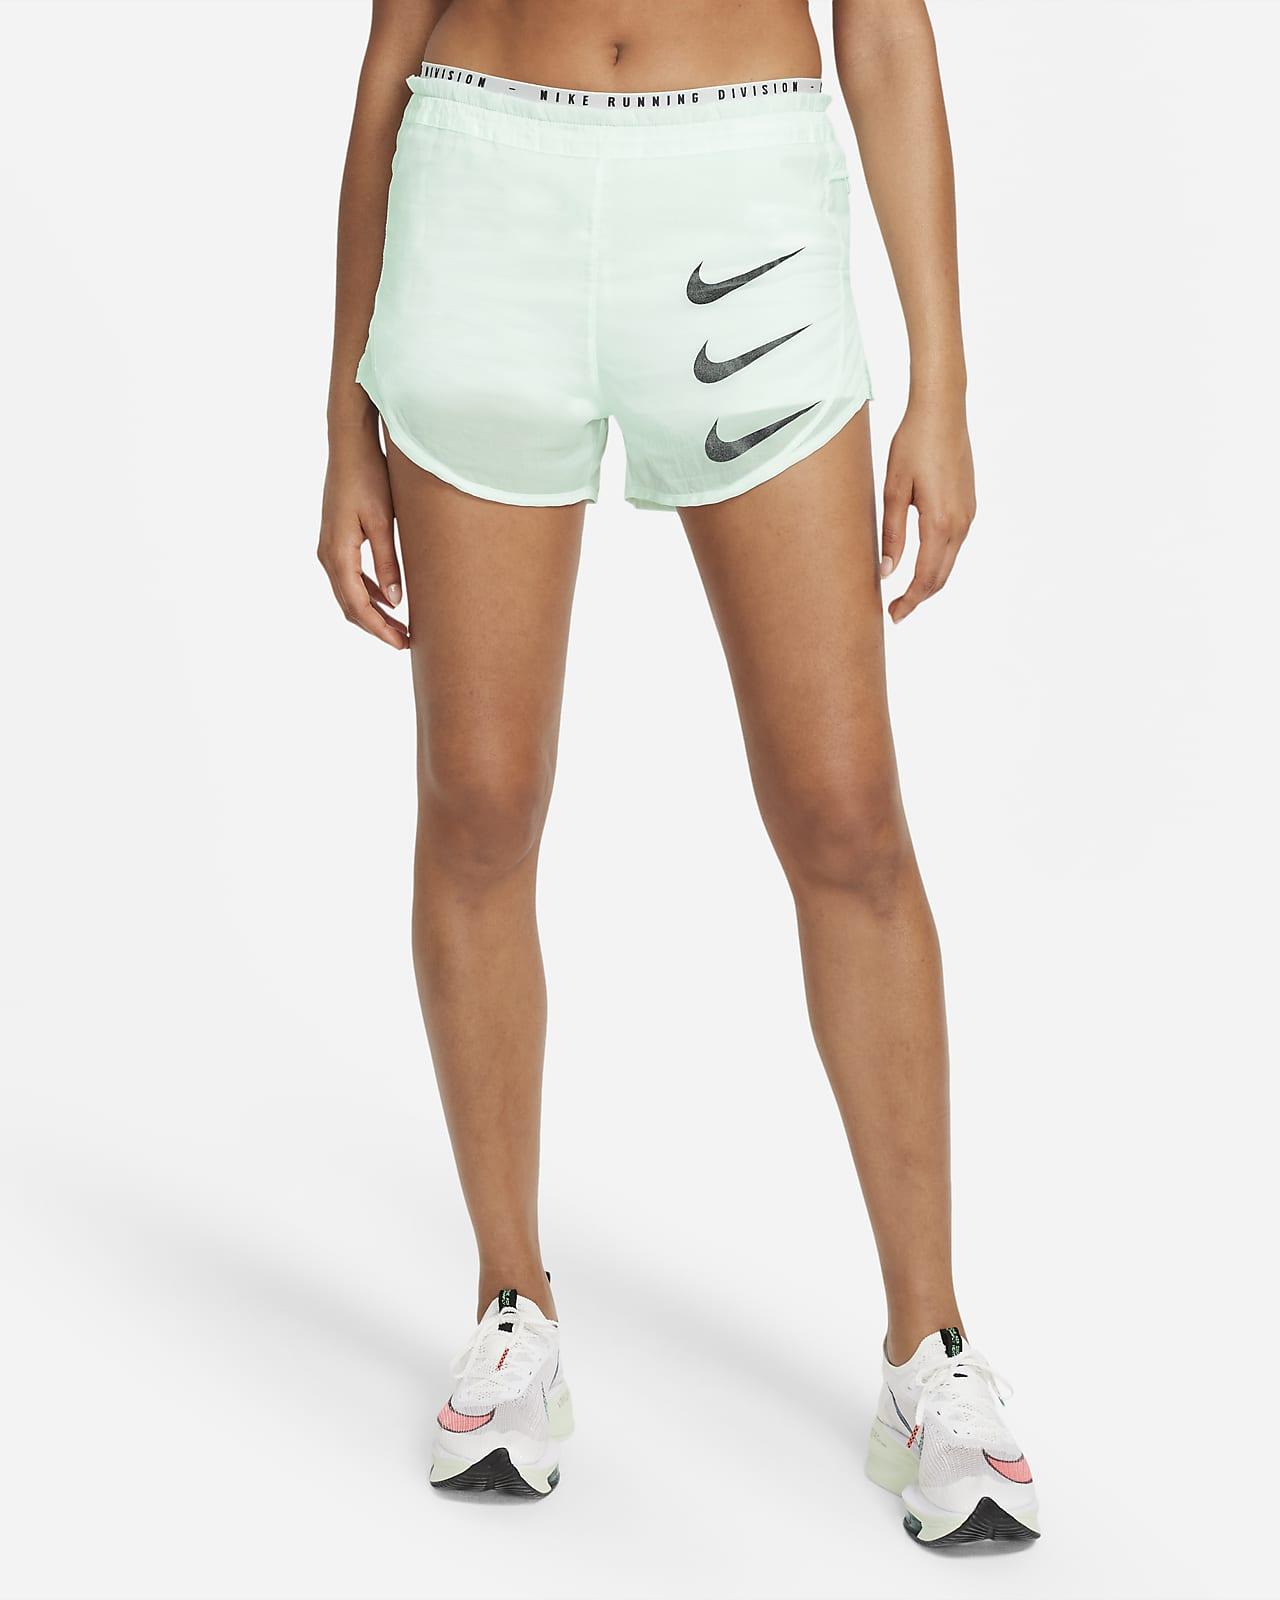 Short de running 2-en-1 Nike Tempo Luxe Run Division pour Femme